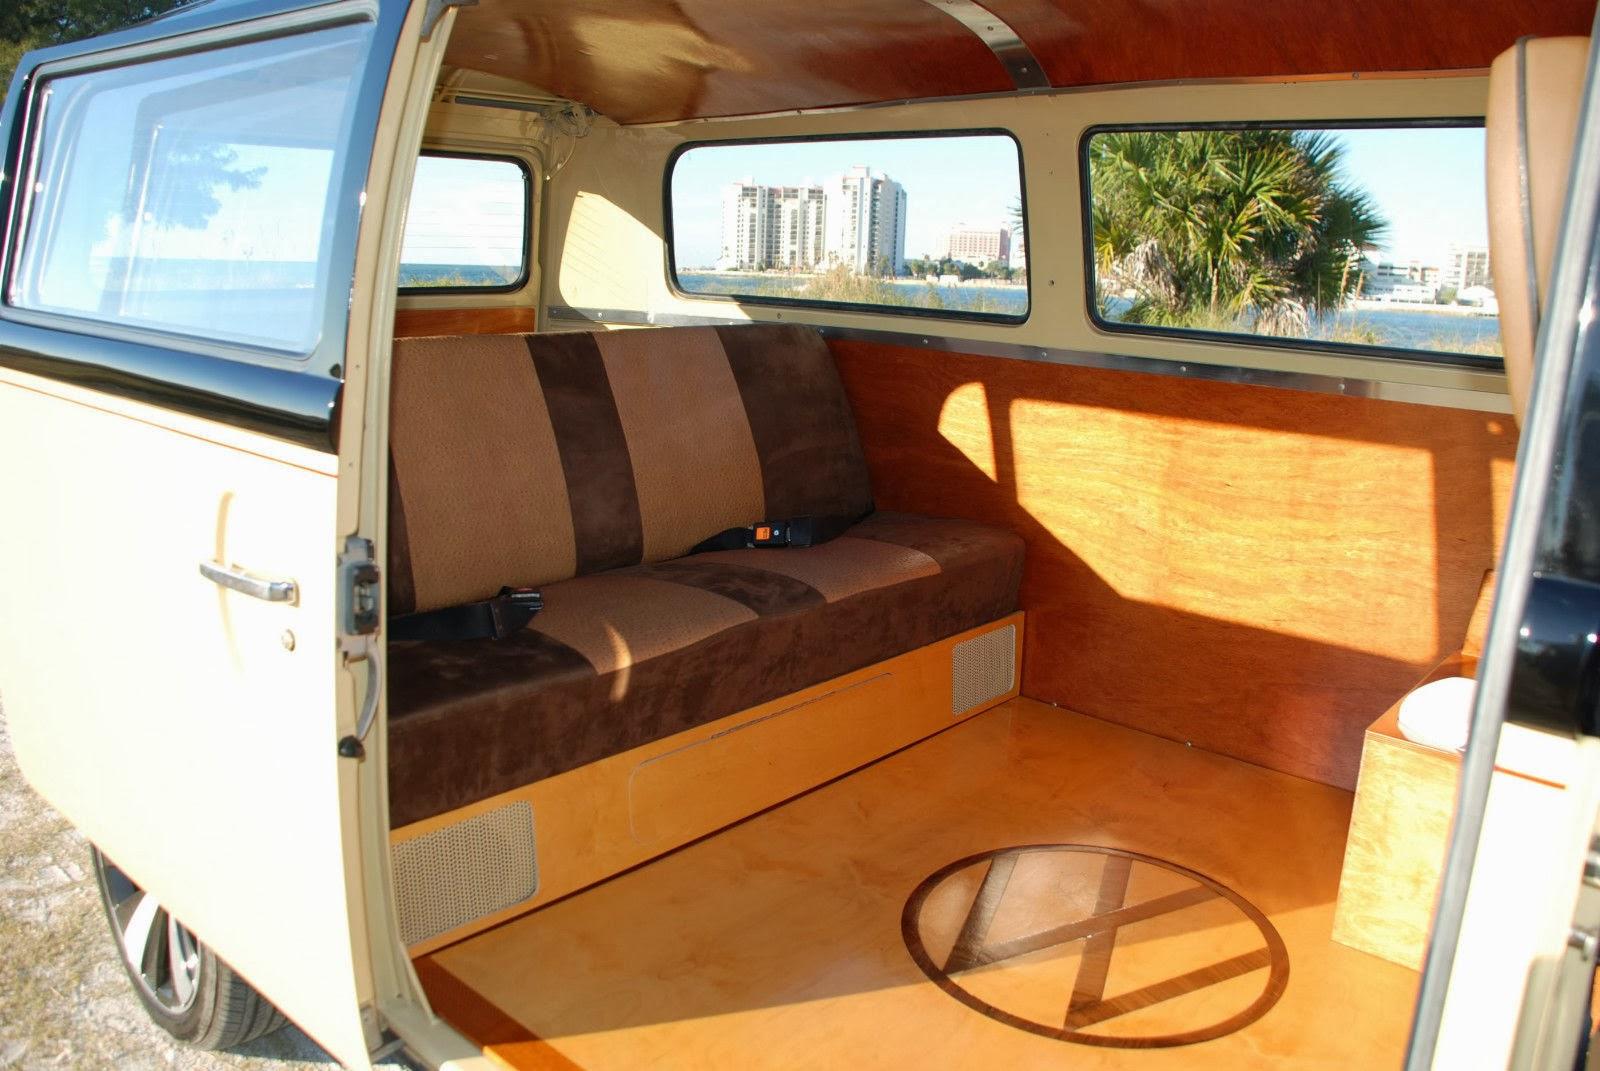 1966 volkswagen van custom shorty bus interior 181627 for Vw kombi interior designs